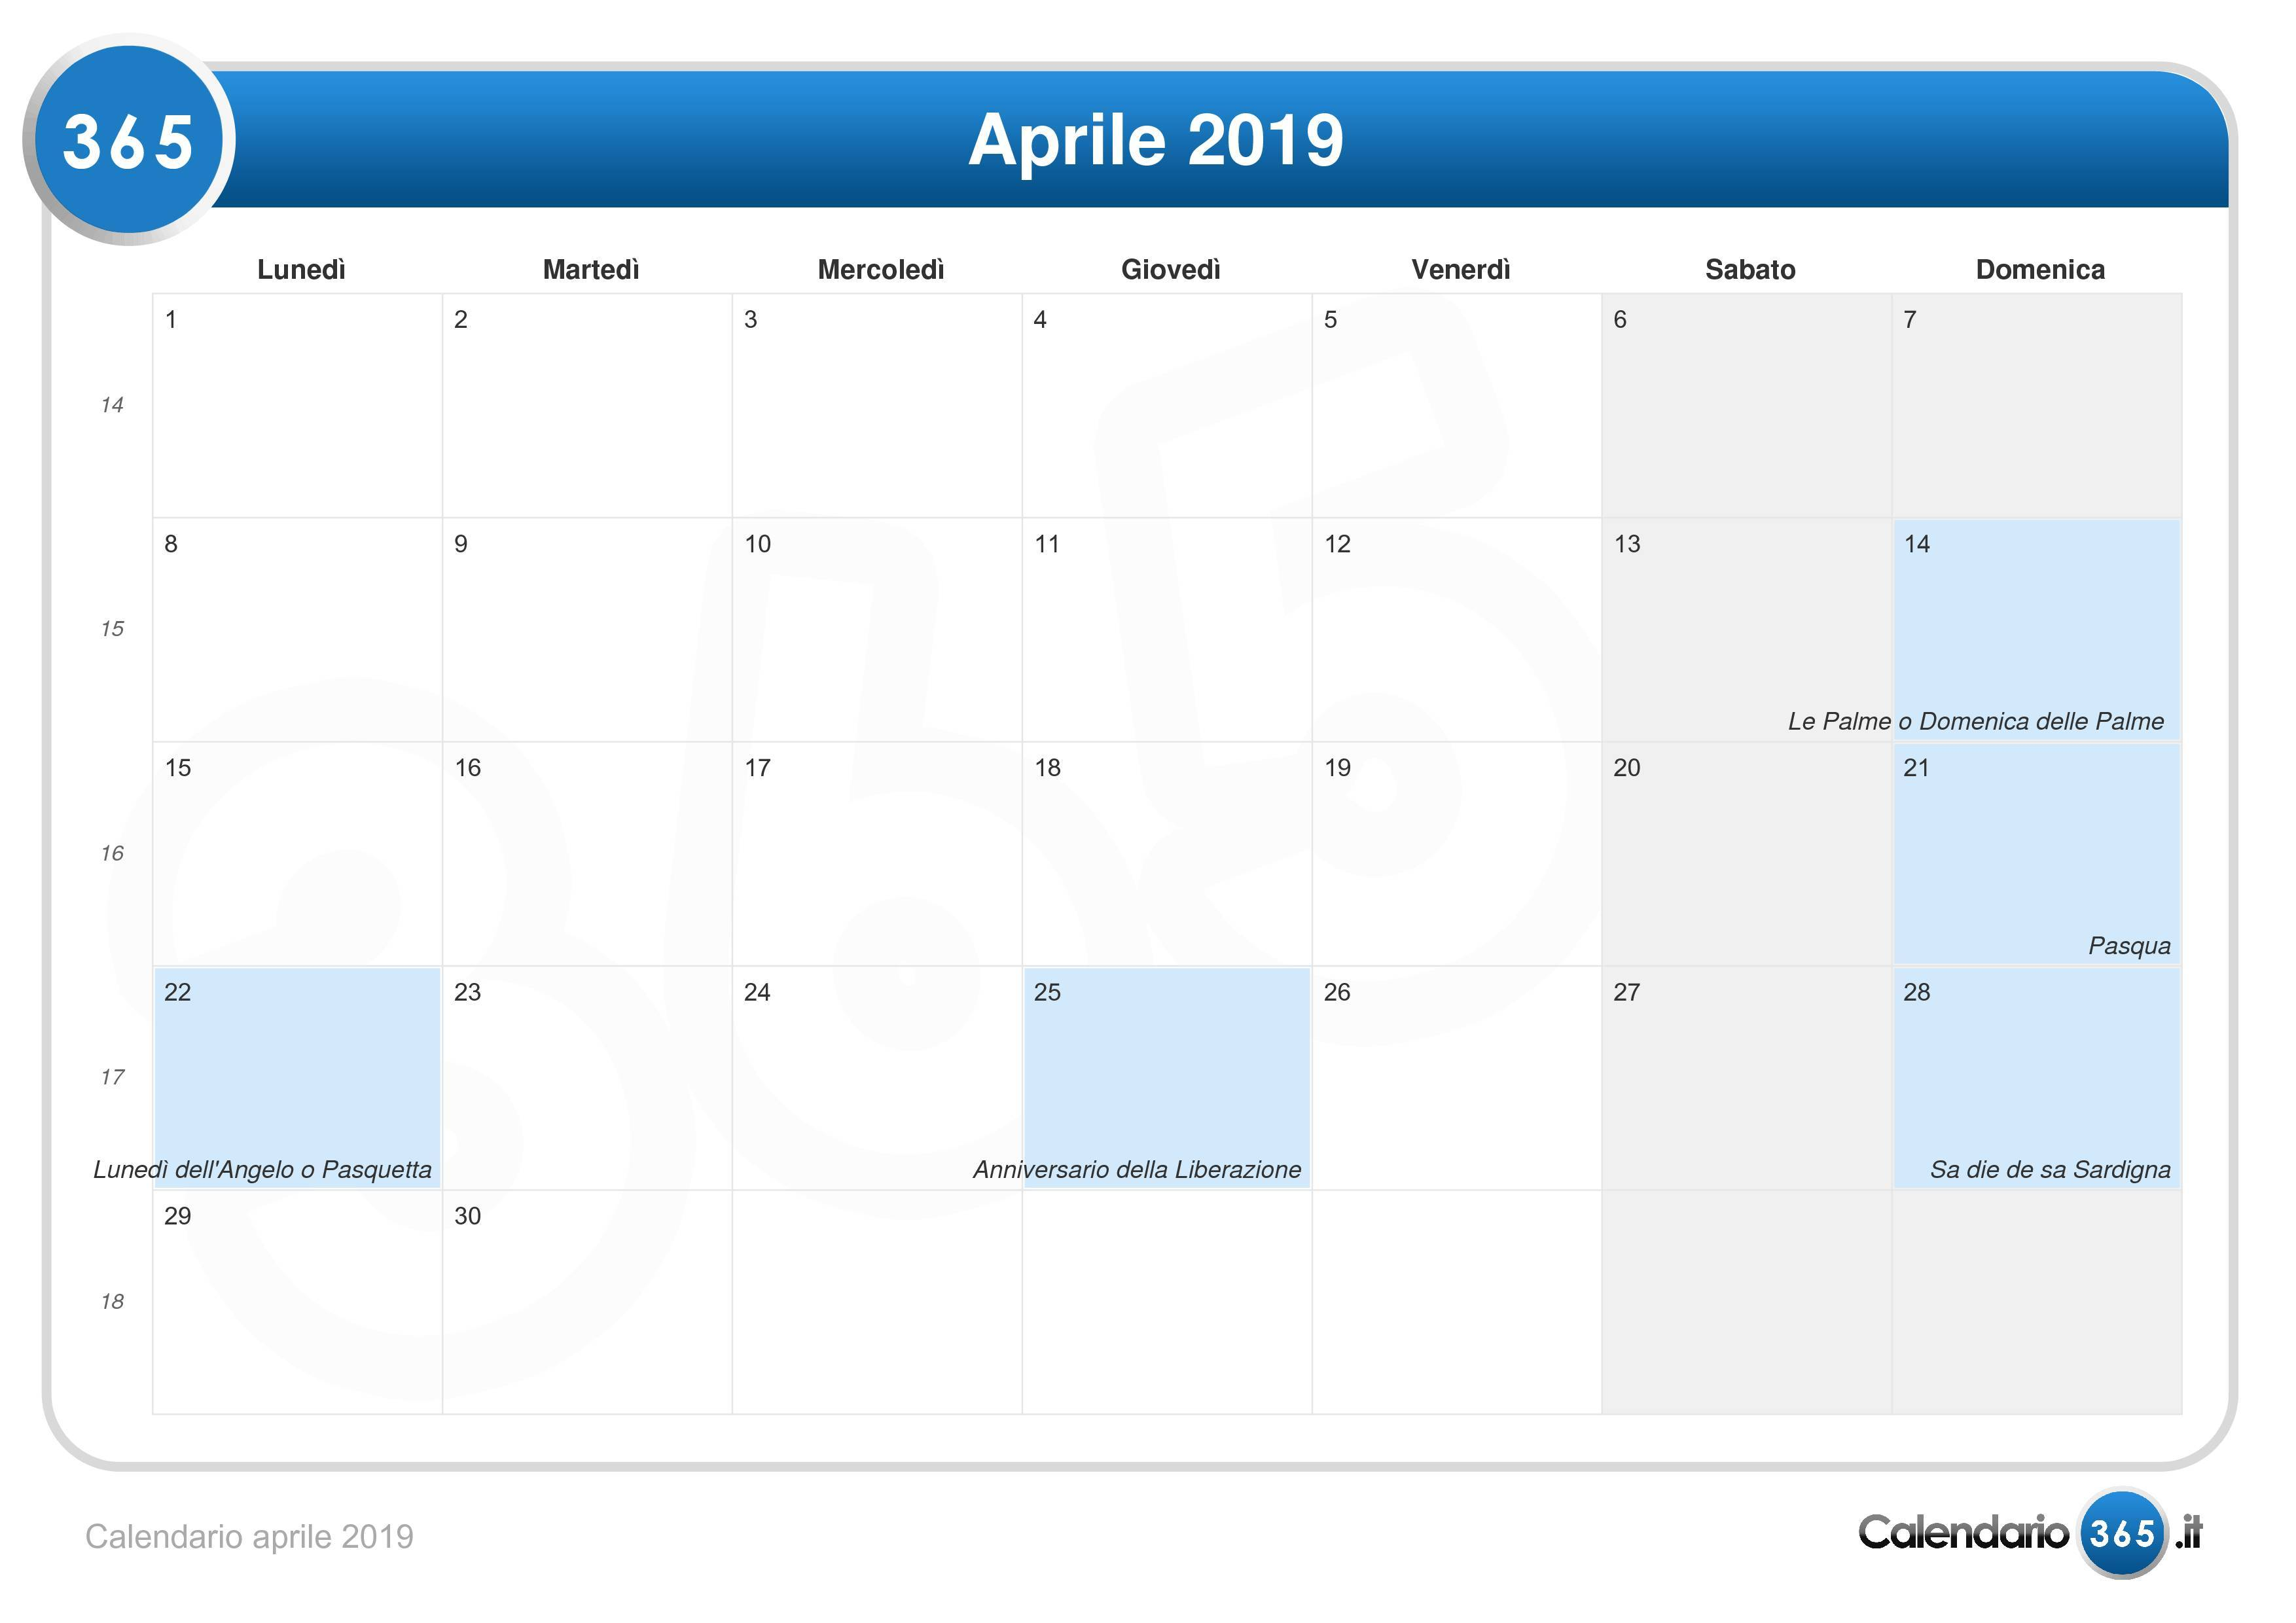 Calendario Cattolico.Calendario Aprile 2019